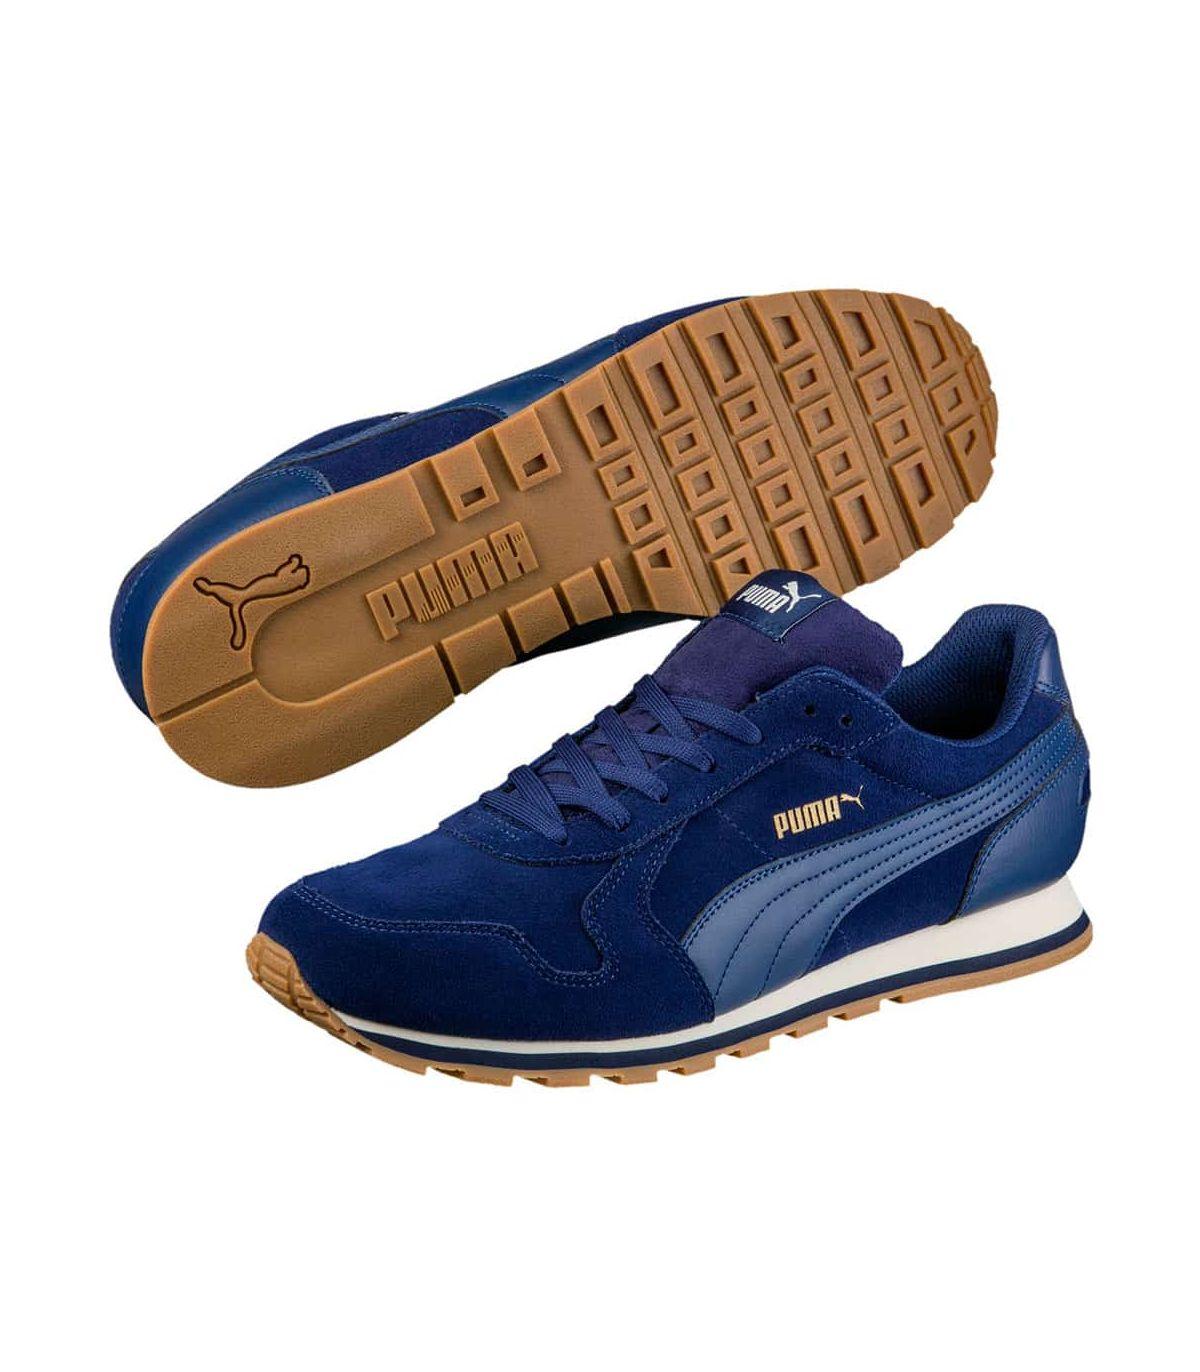 Puma ST Runner SD Sizes 46 Color Azul